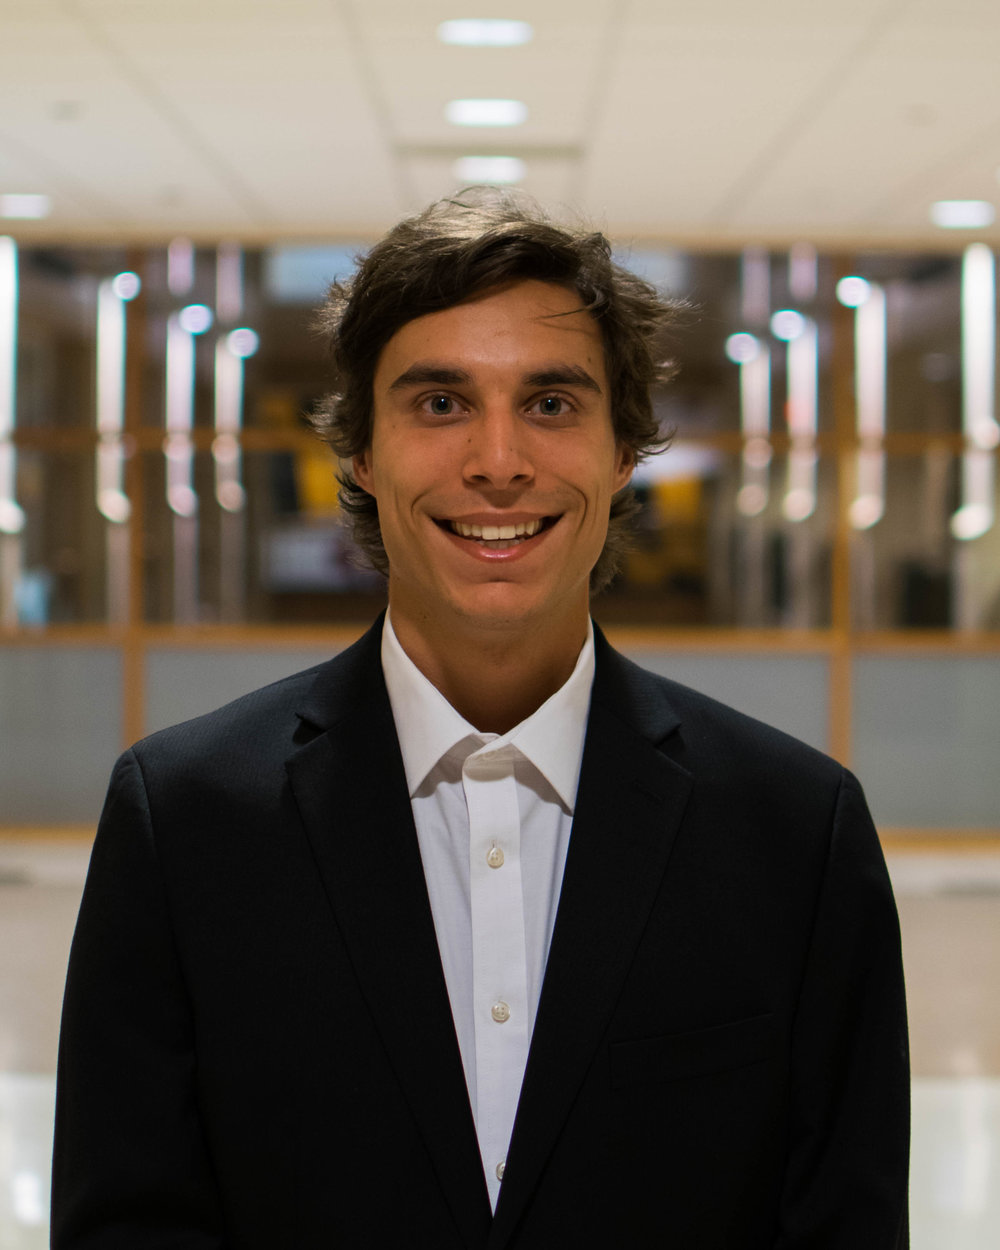 Tiago DeSouza Director of Visual Media terpama.visual@gmail.com